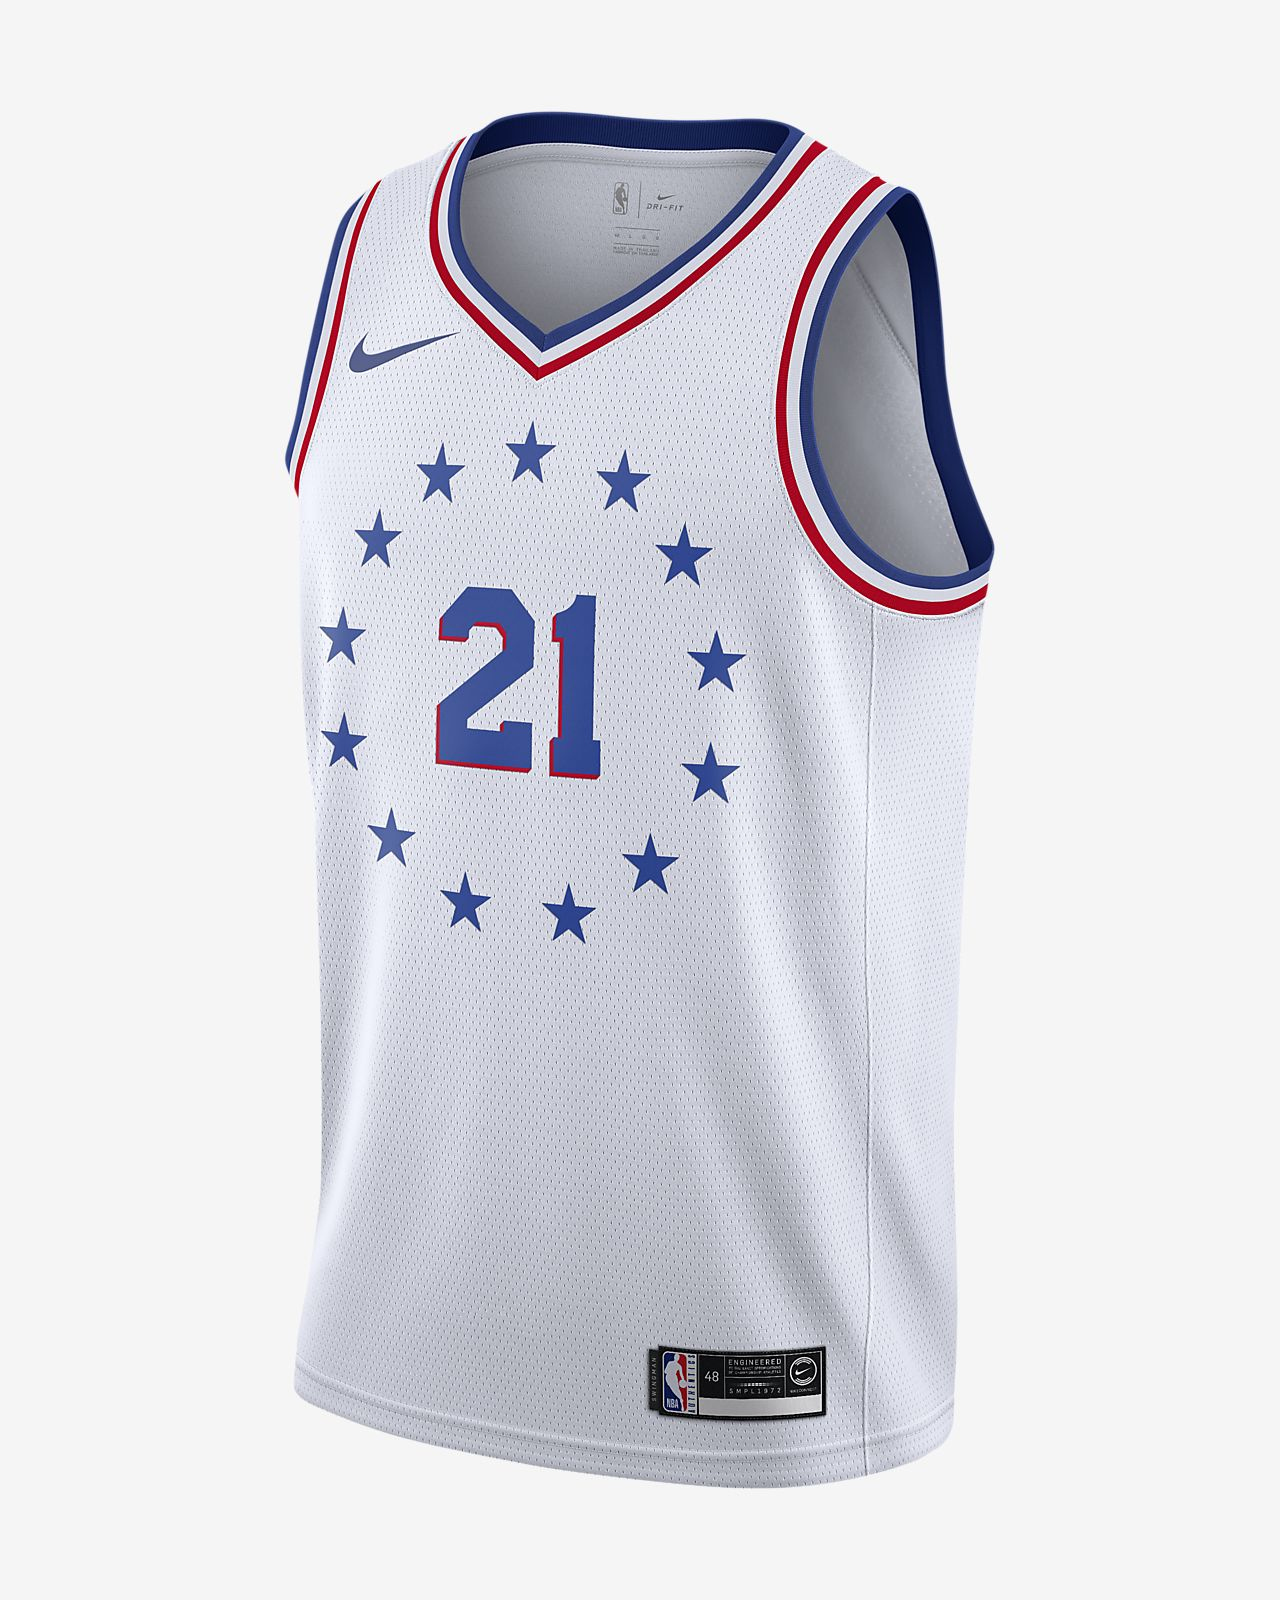 Maillot connecté Nike NBA Joel Embiid Earned City Edition Swingman (Philadelphia 76ers) pour Homme